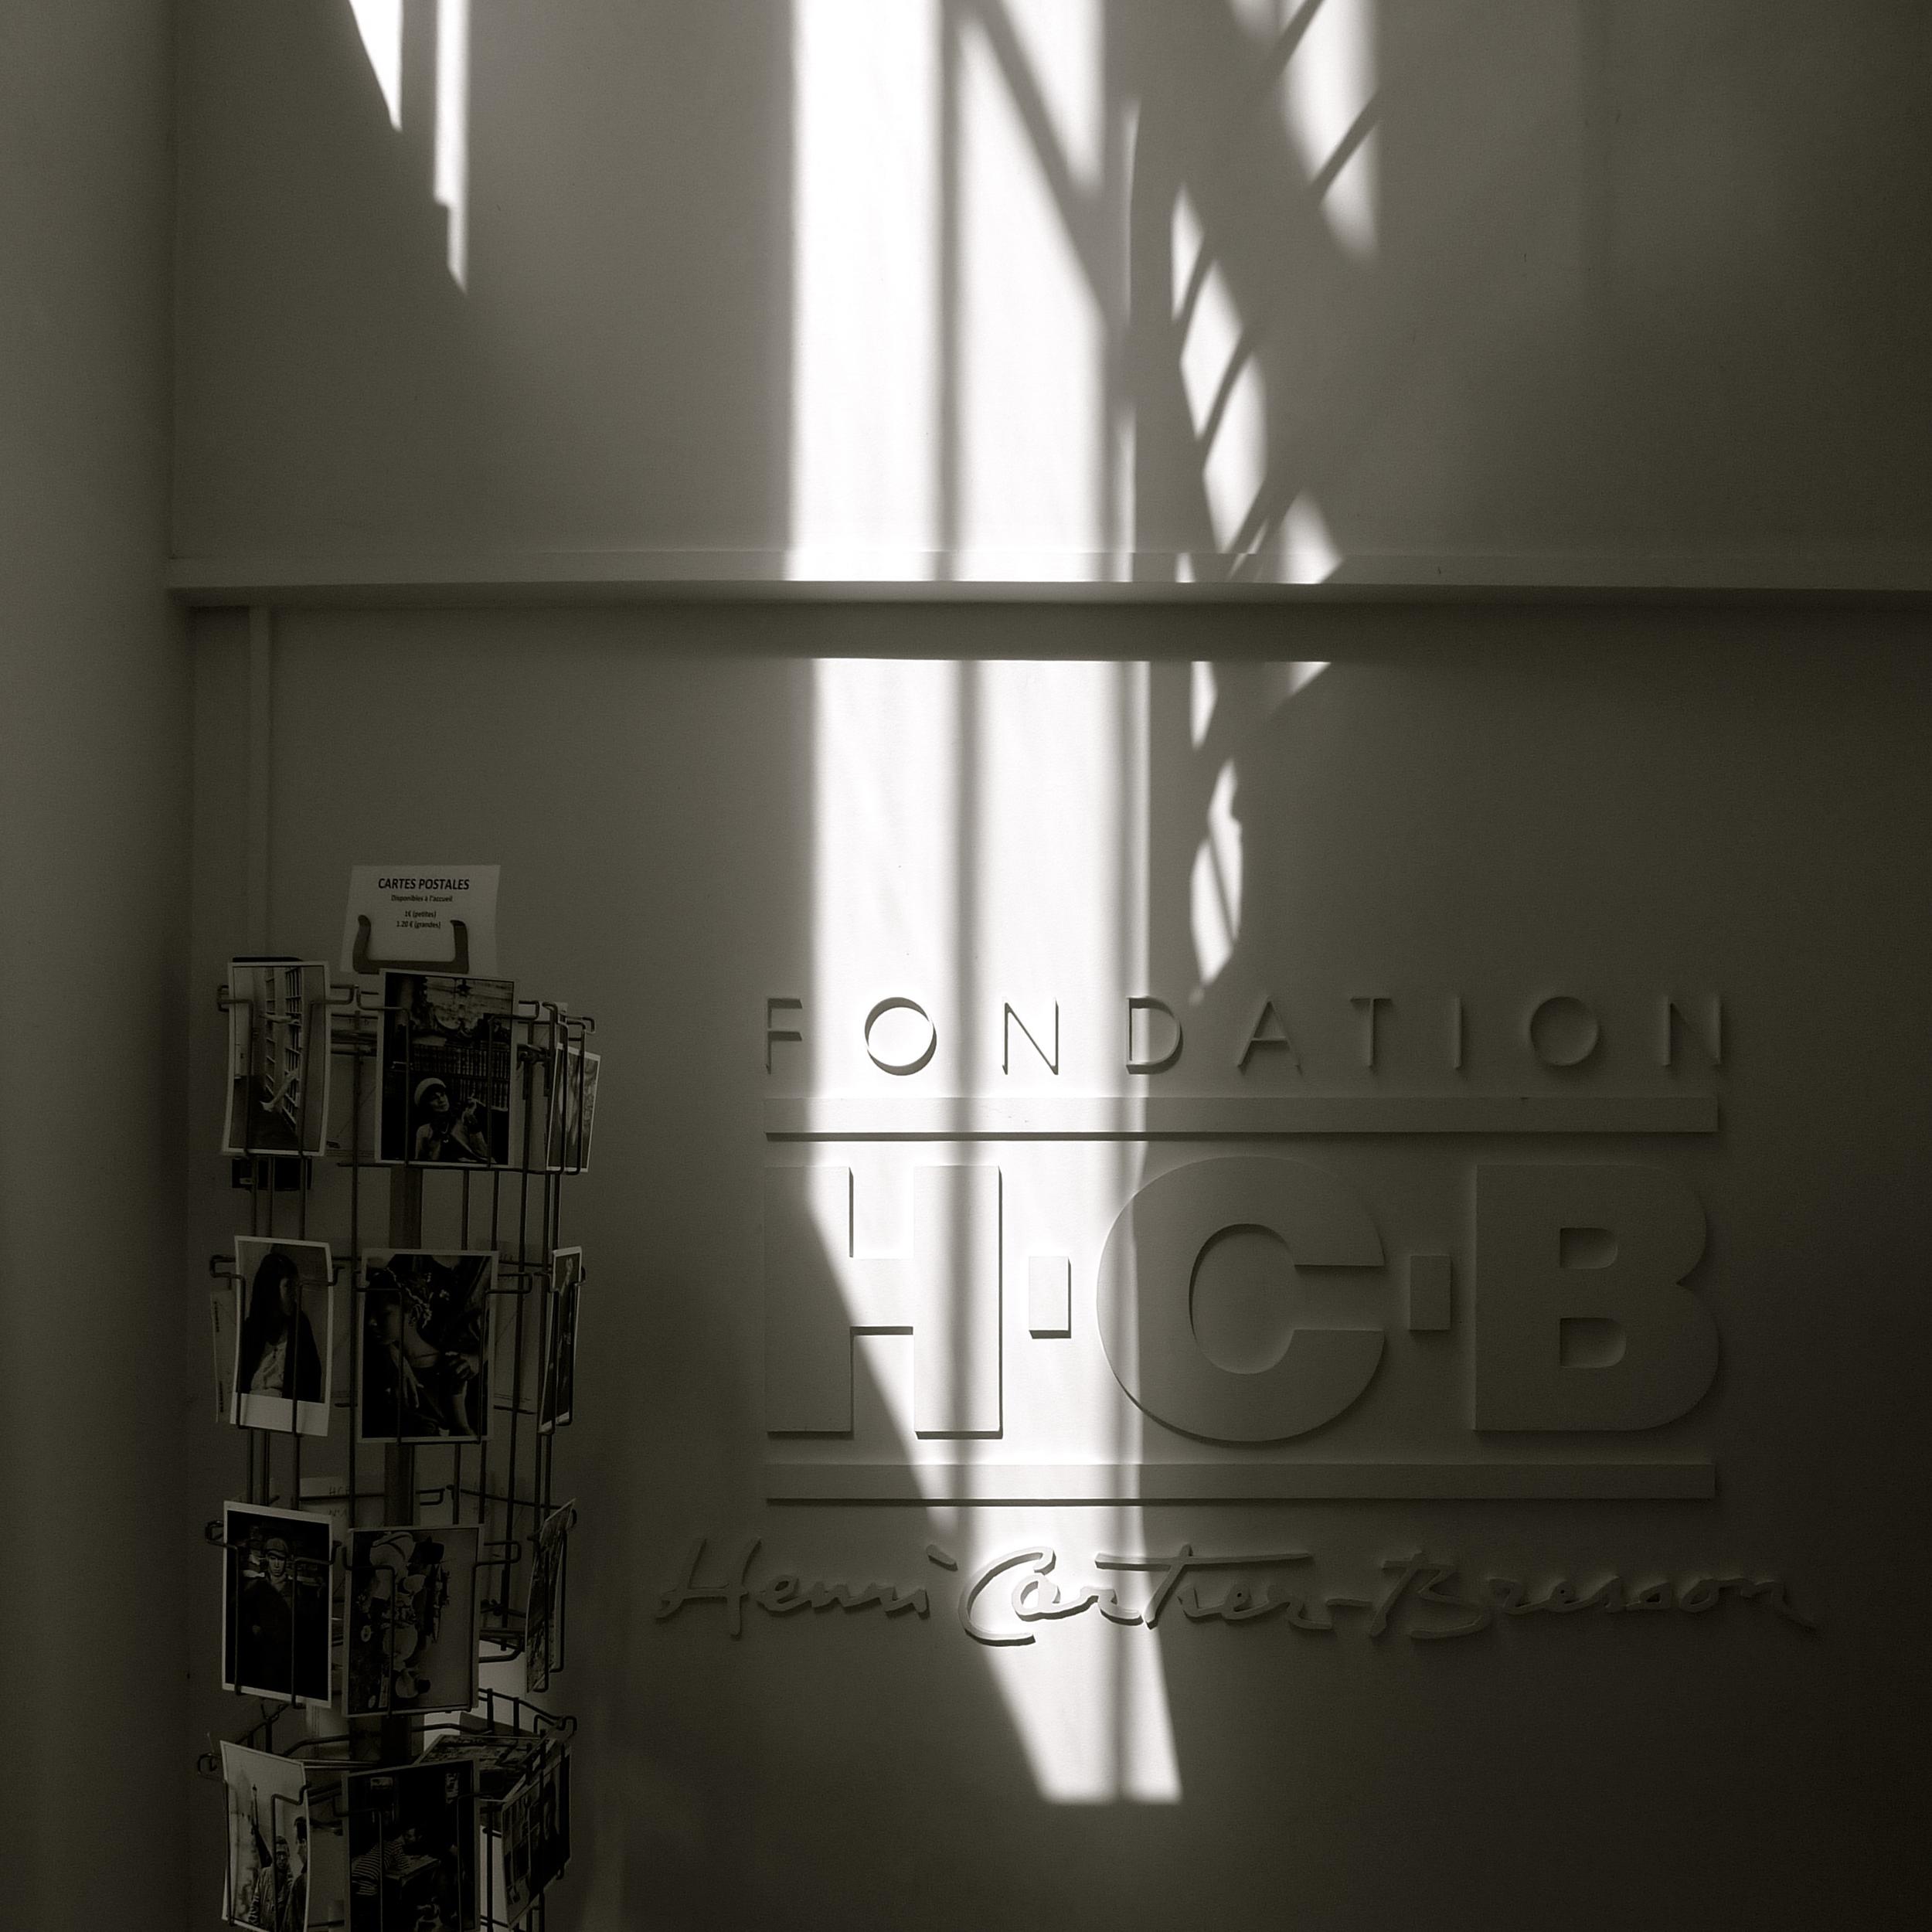 Fondation Henri Cartier Bresson - 004